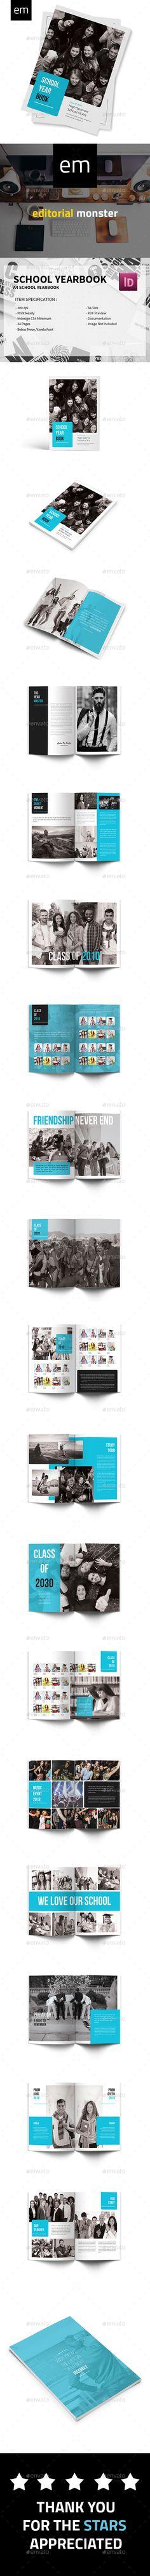 Templates | yearbook templates | Pinterest | Templates